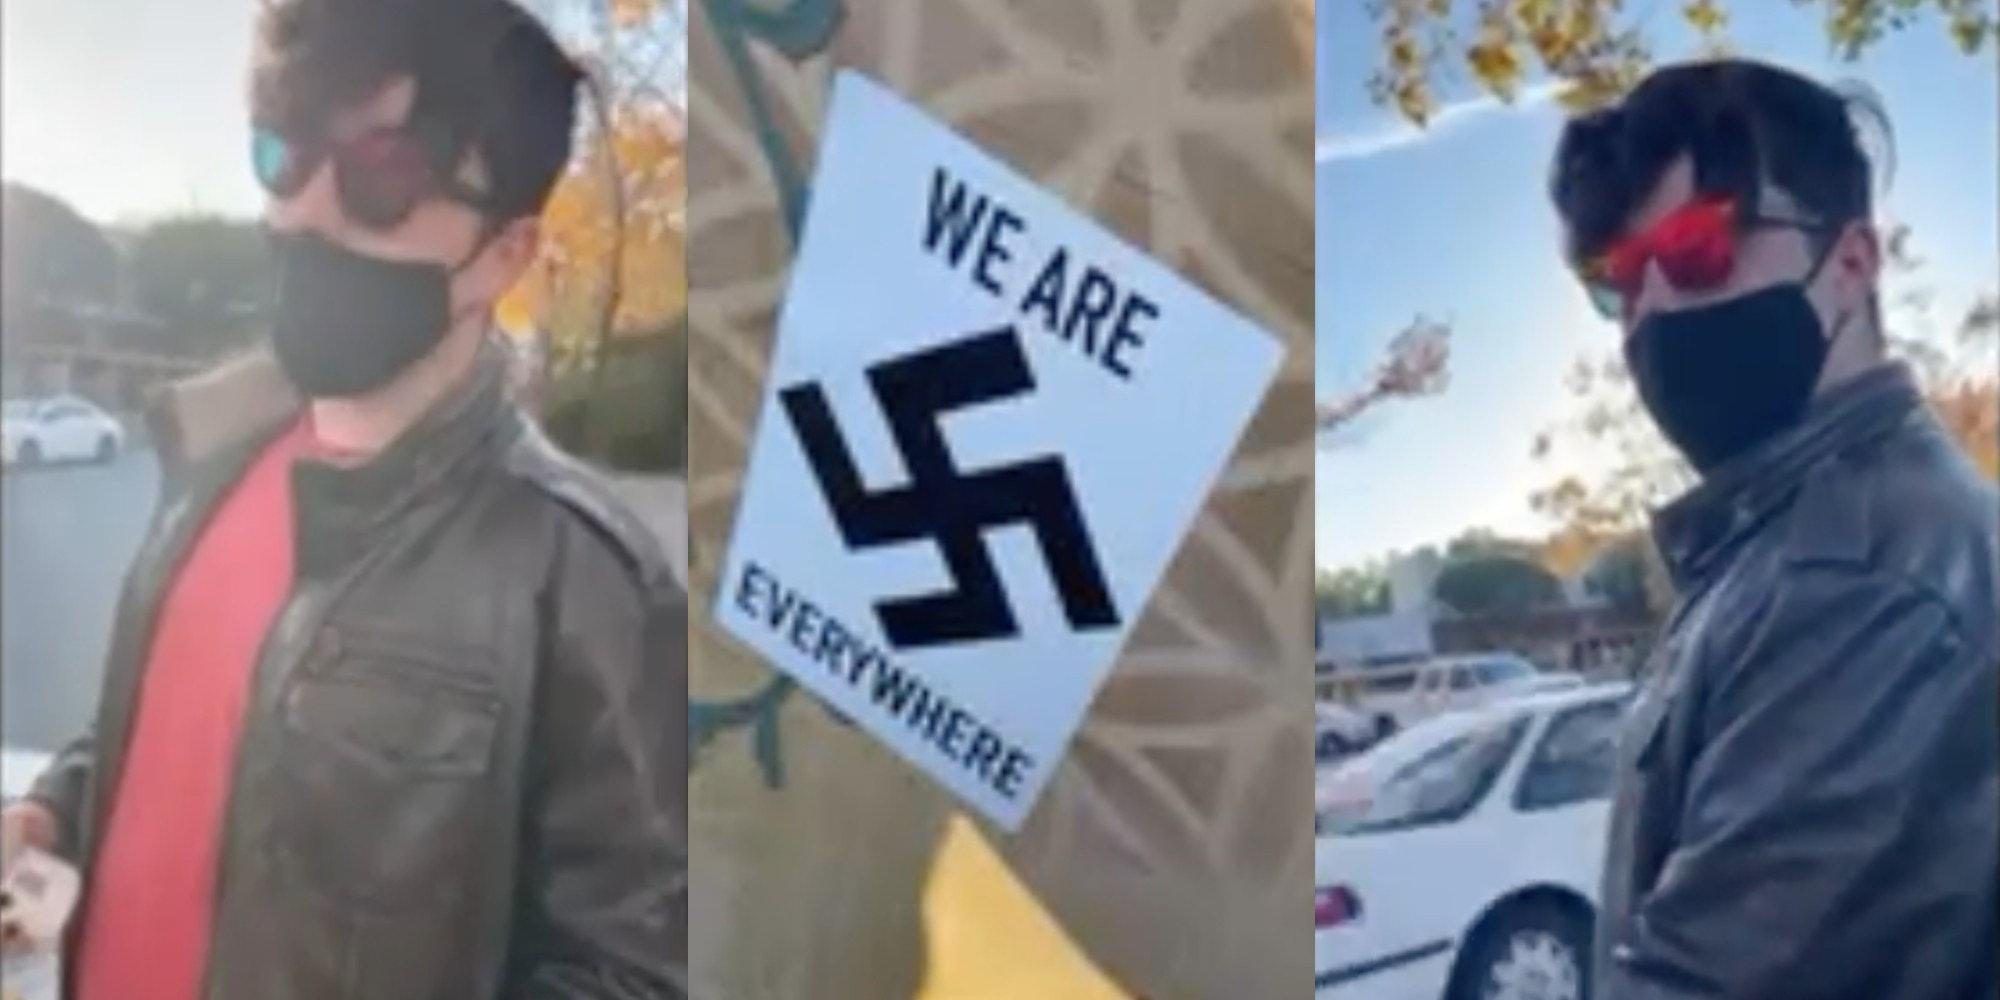 A man placing Nazi stickers around California